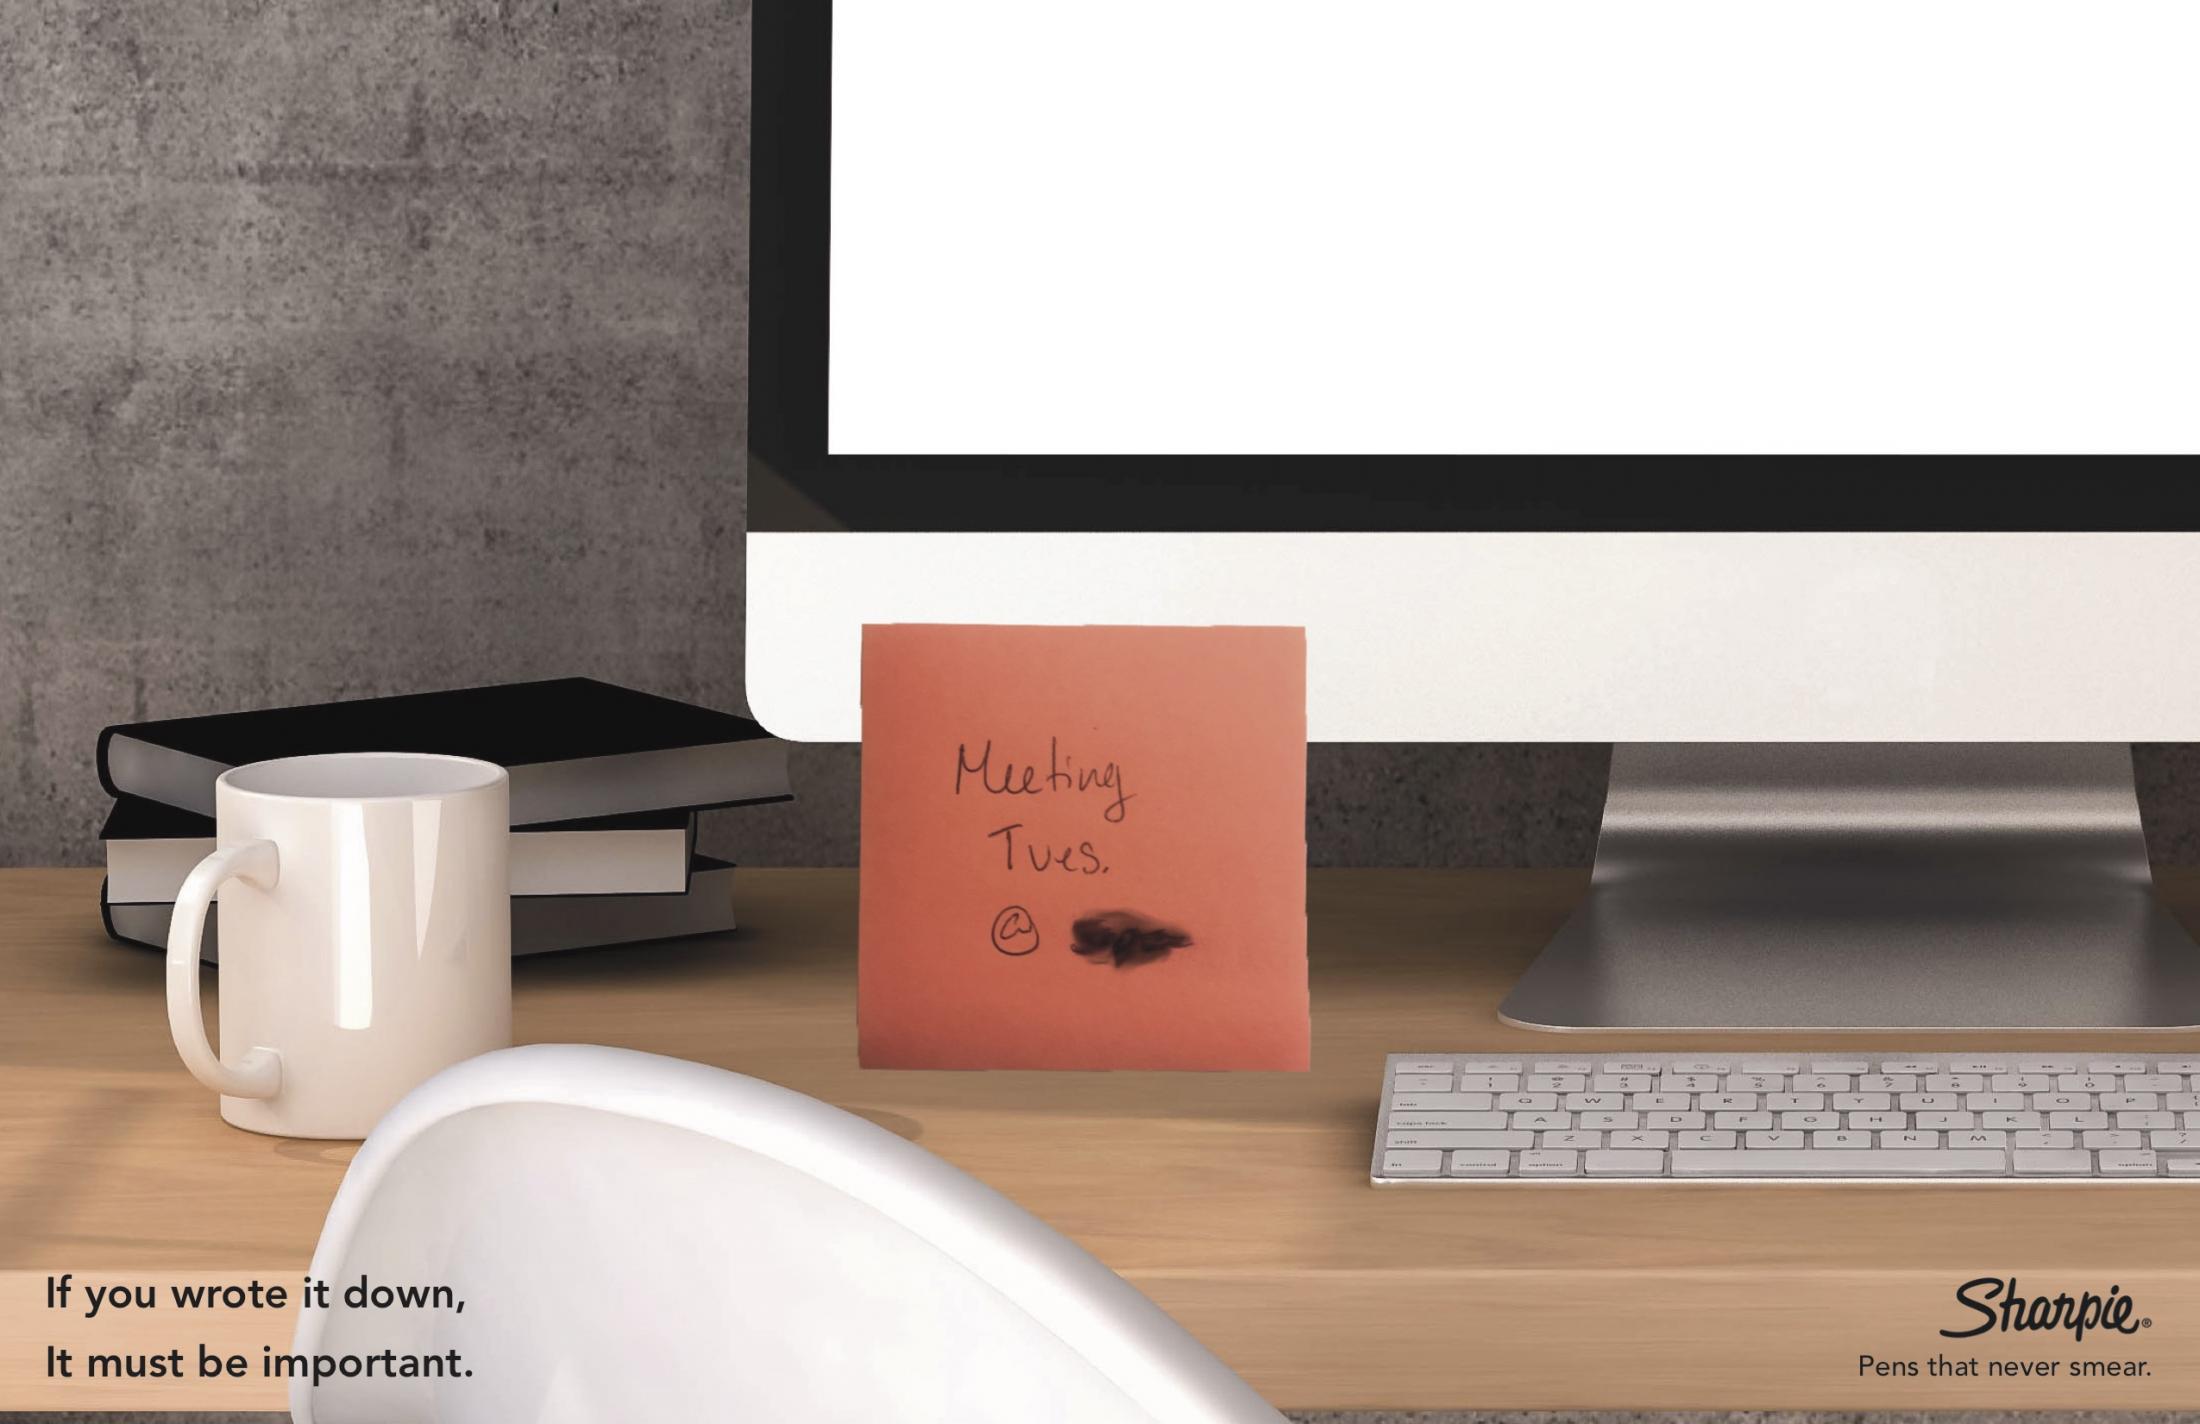 Sharpie Print Ad - Meeting Reminder